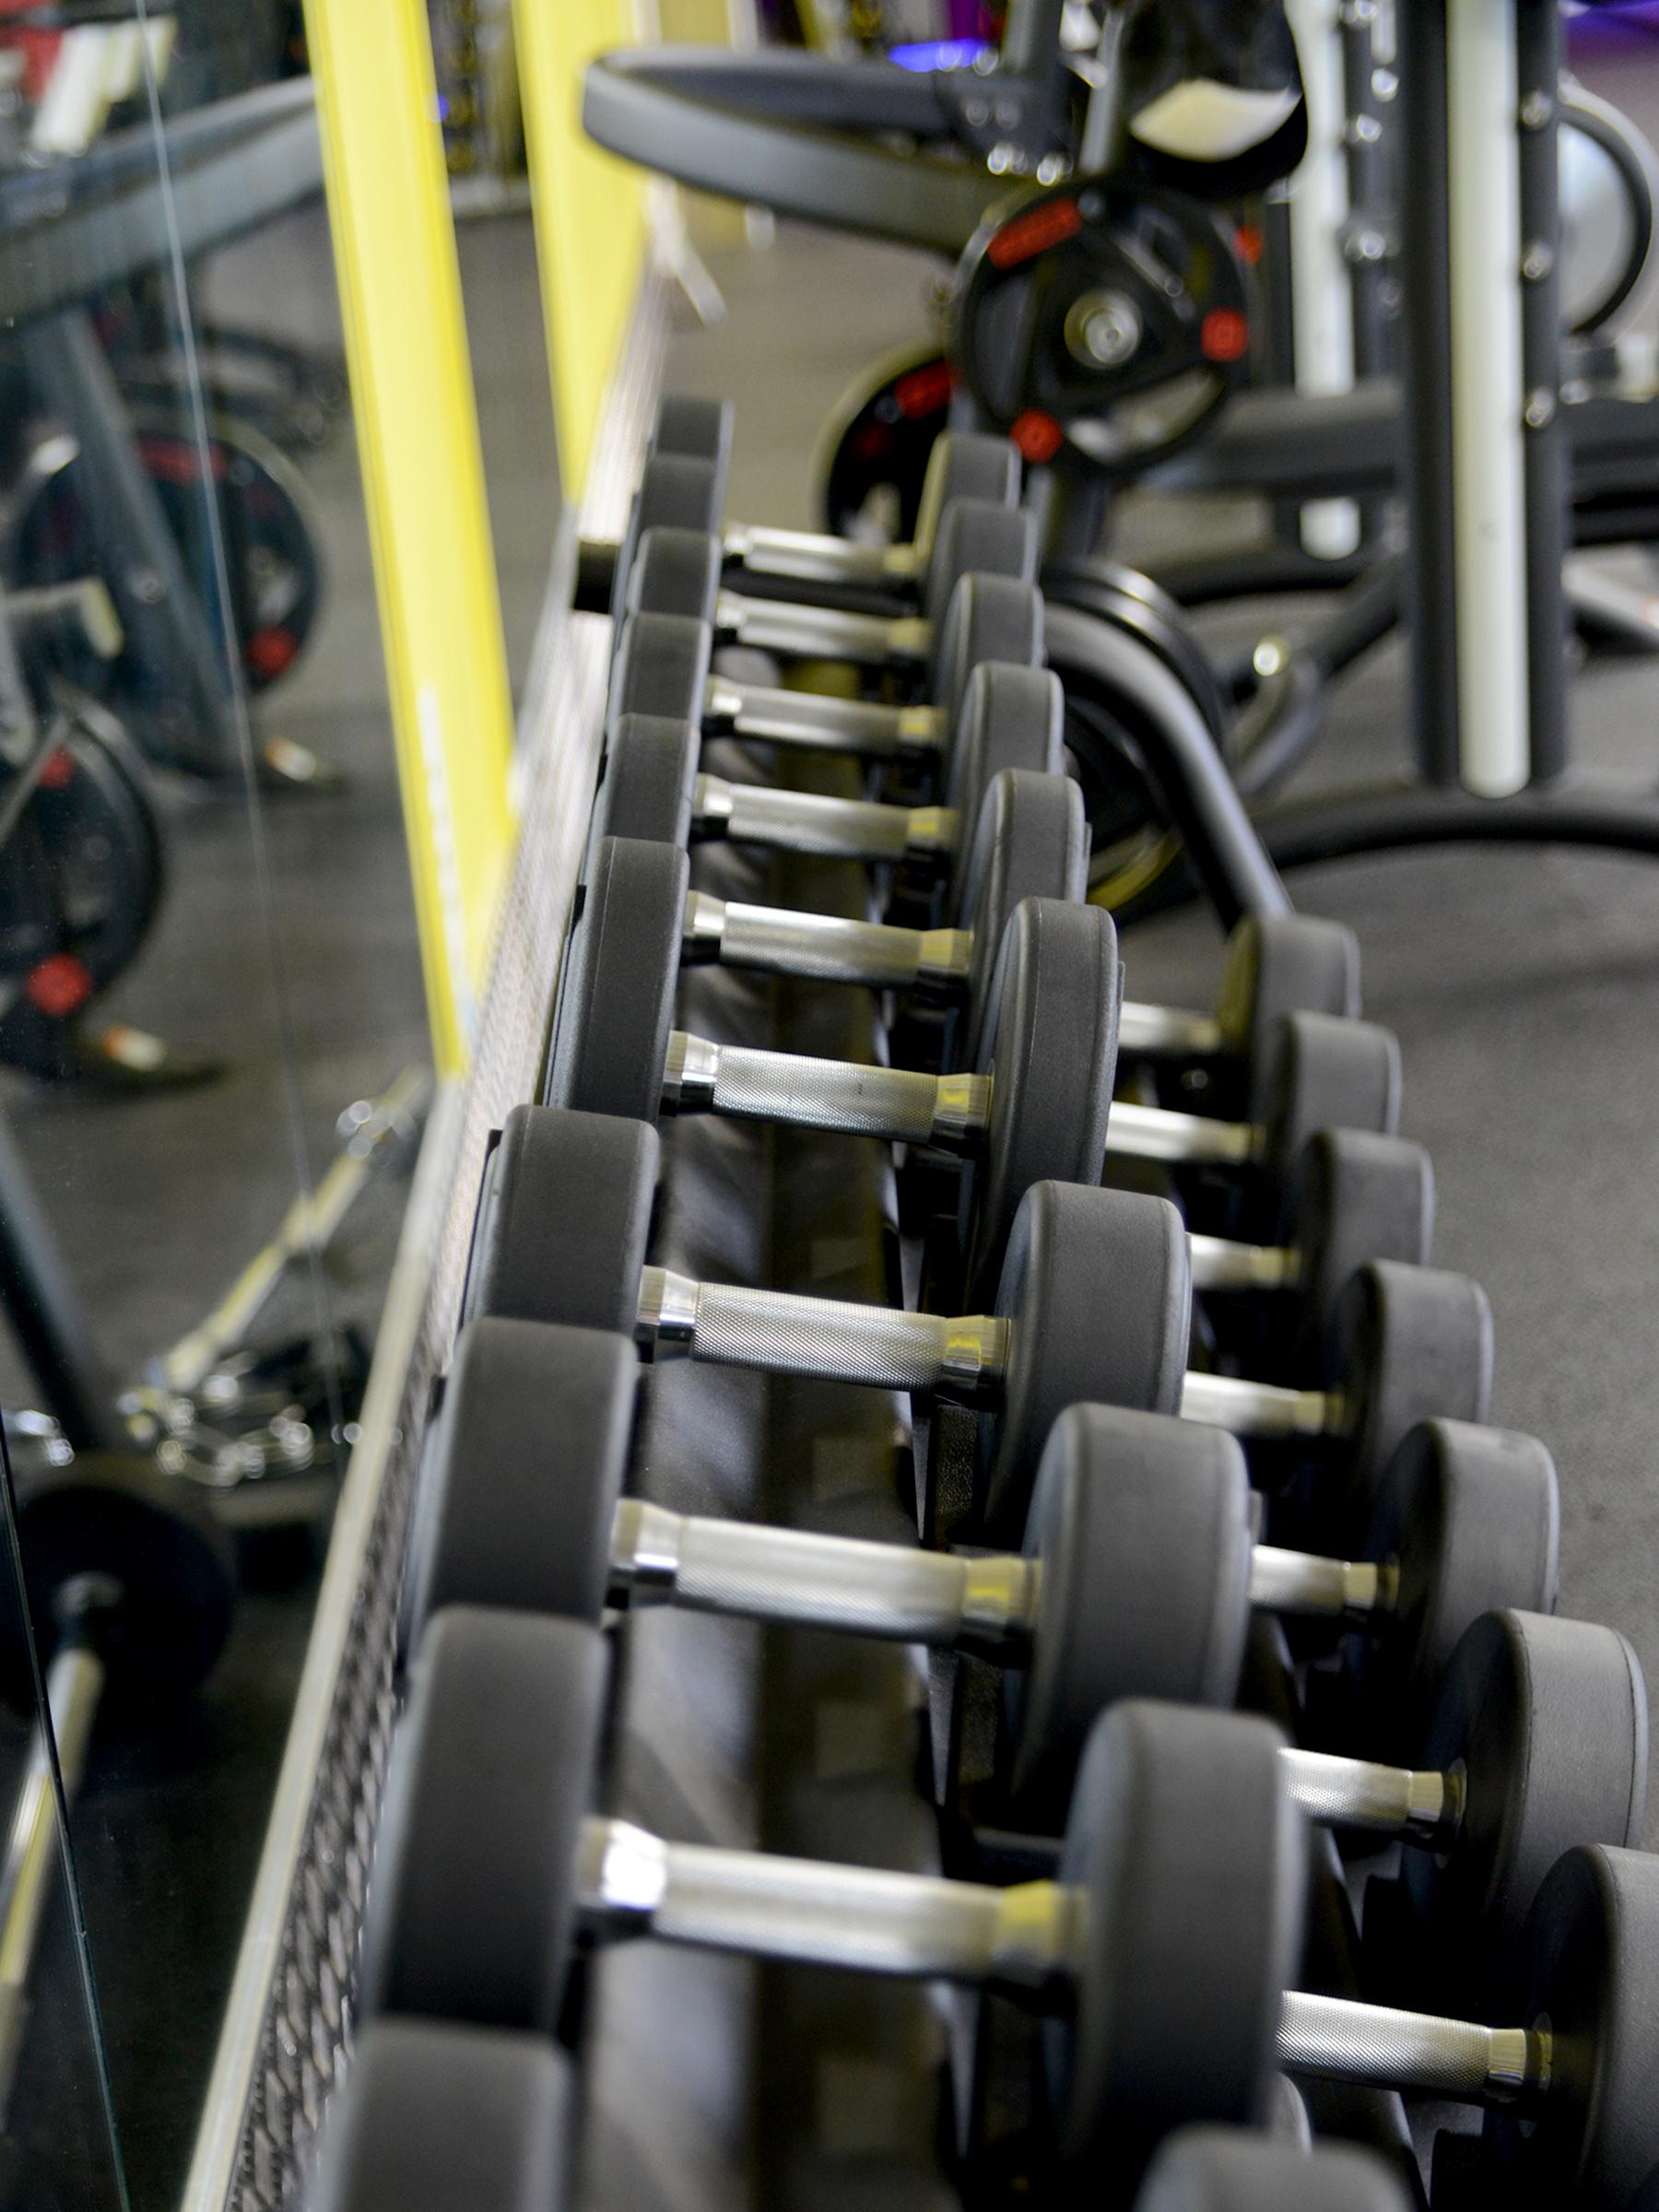 Brean Gym